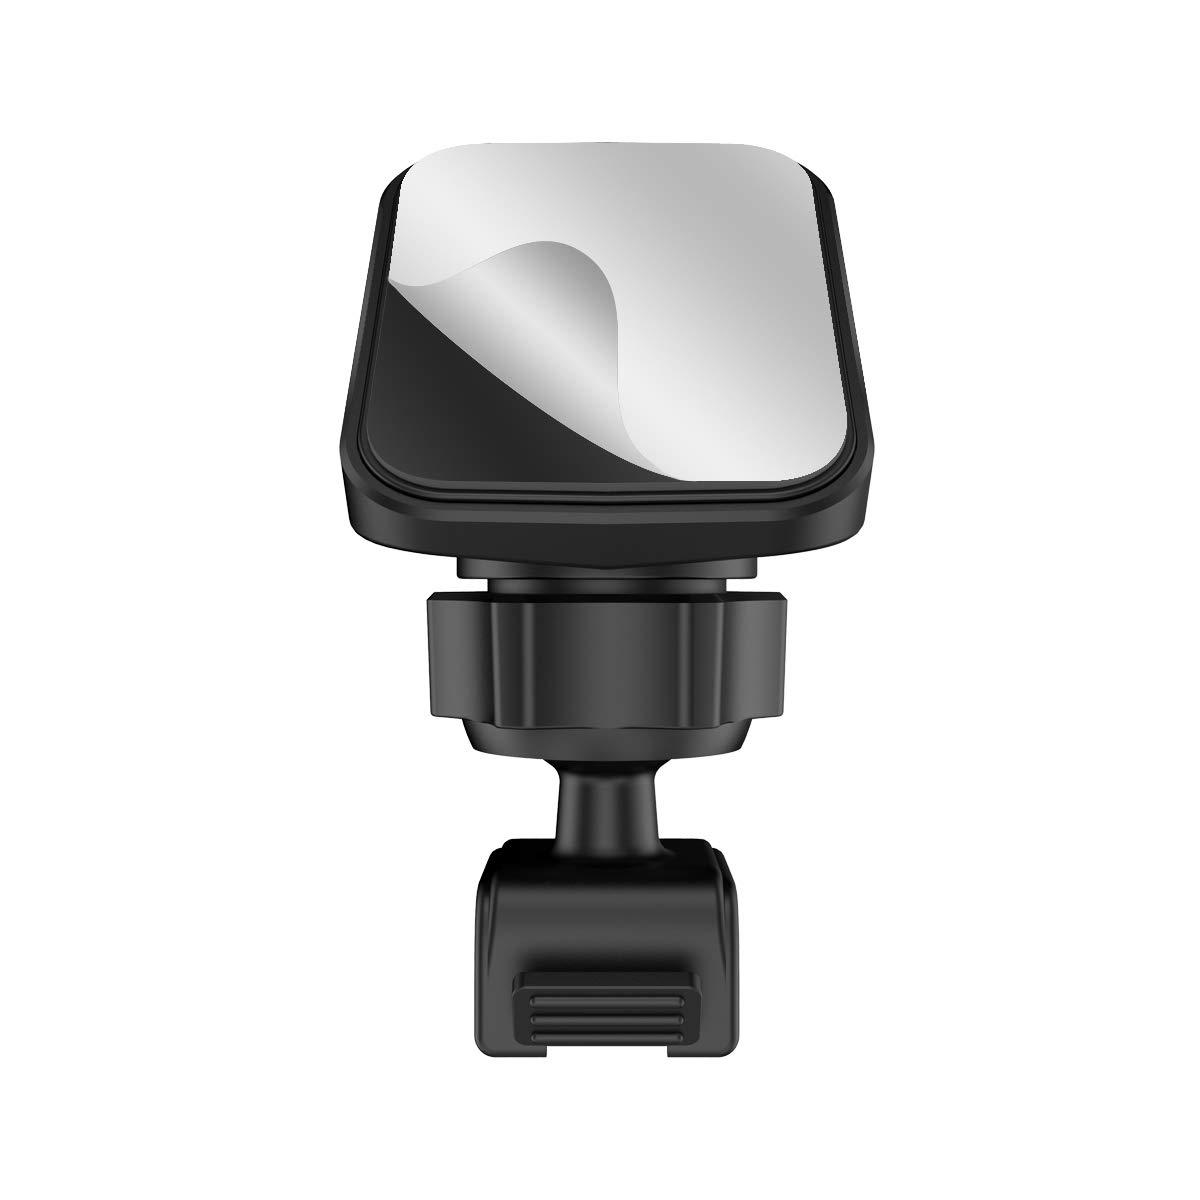 VANTRUE N2 Pro/ N2/ X3/ T2/ R3 Adhesive Dash Cam Windshield Mount